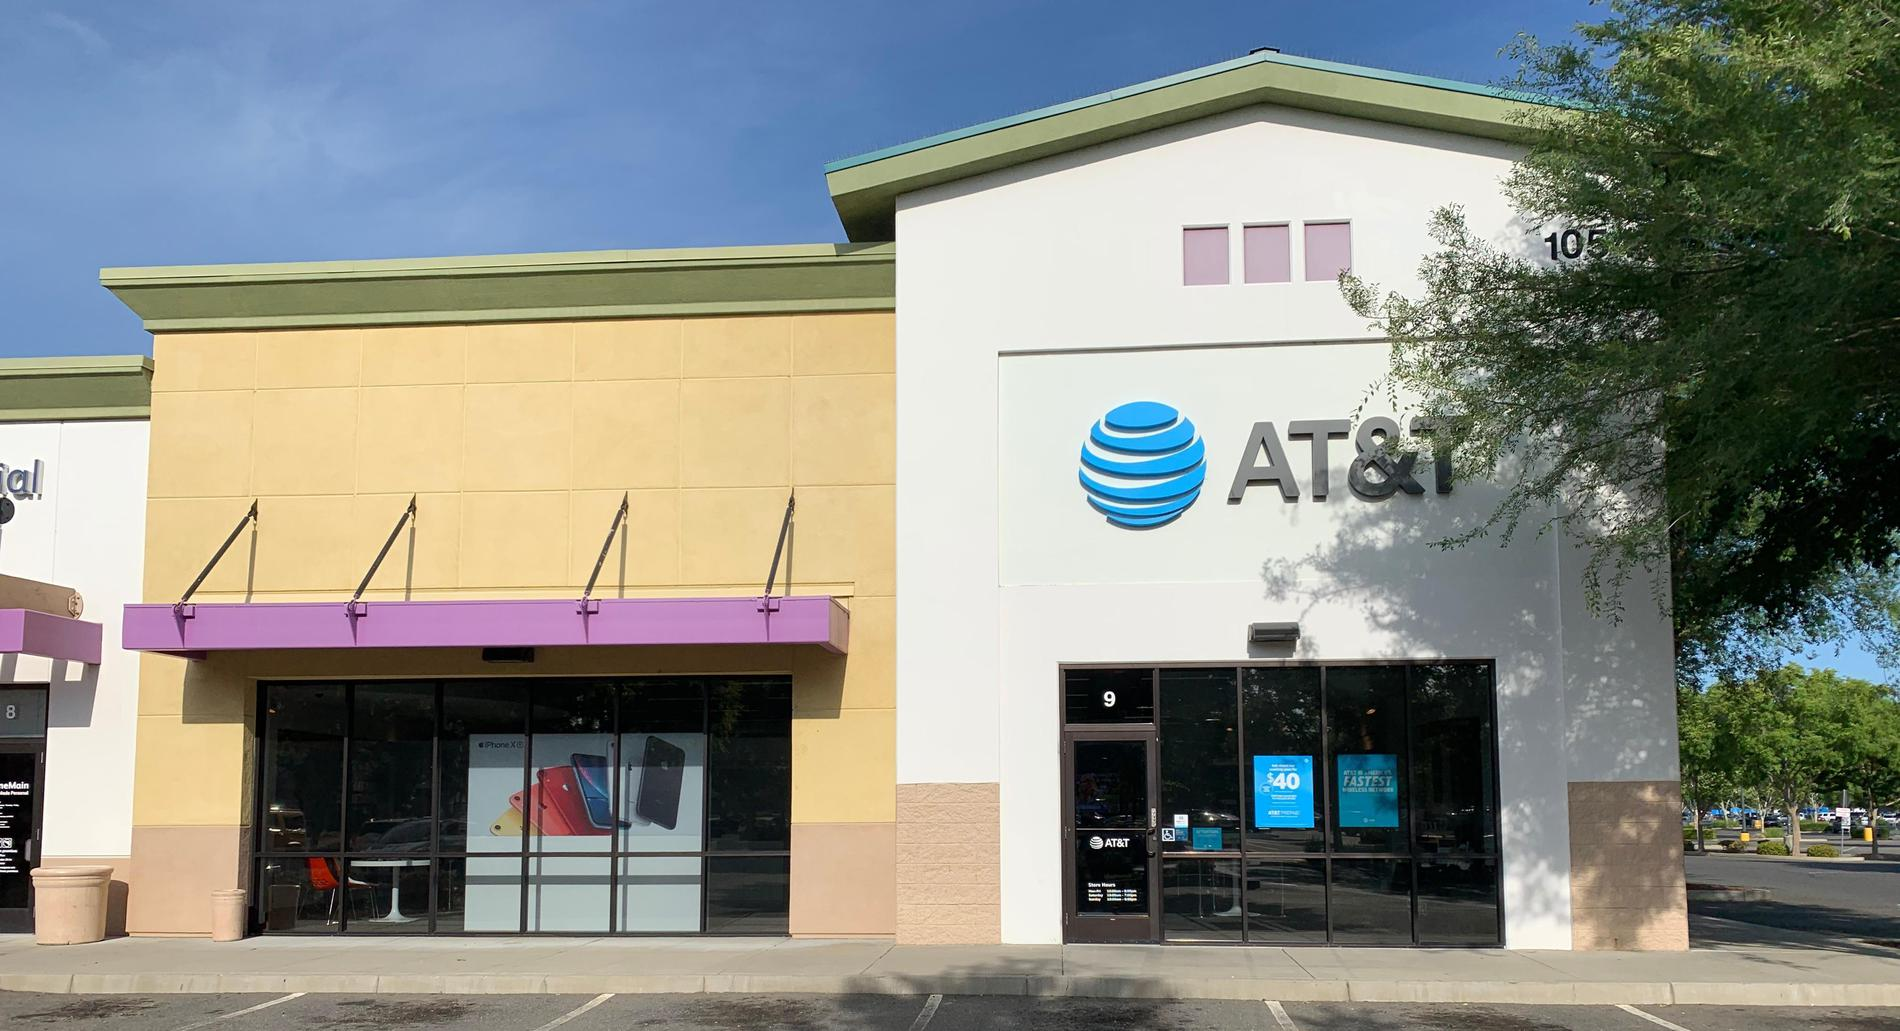 AT&T Store - Yuba City - Yuba City, CA